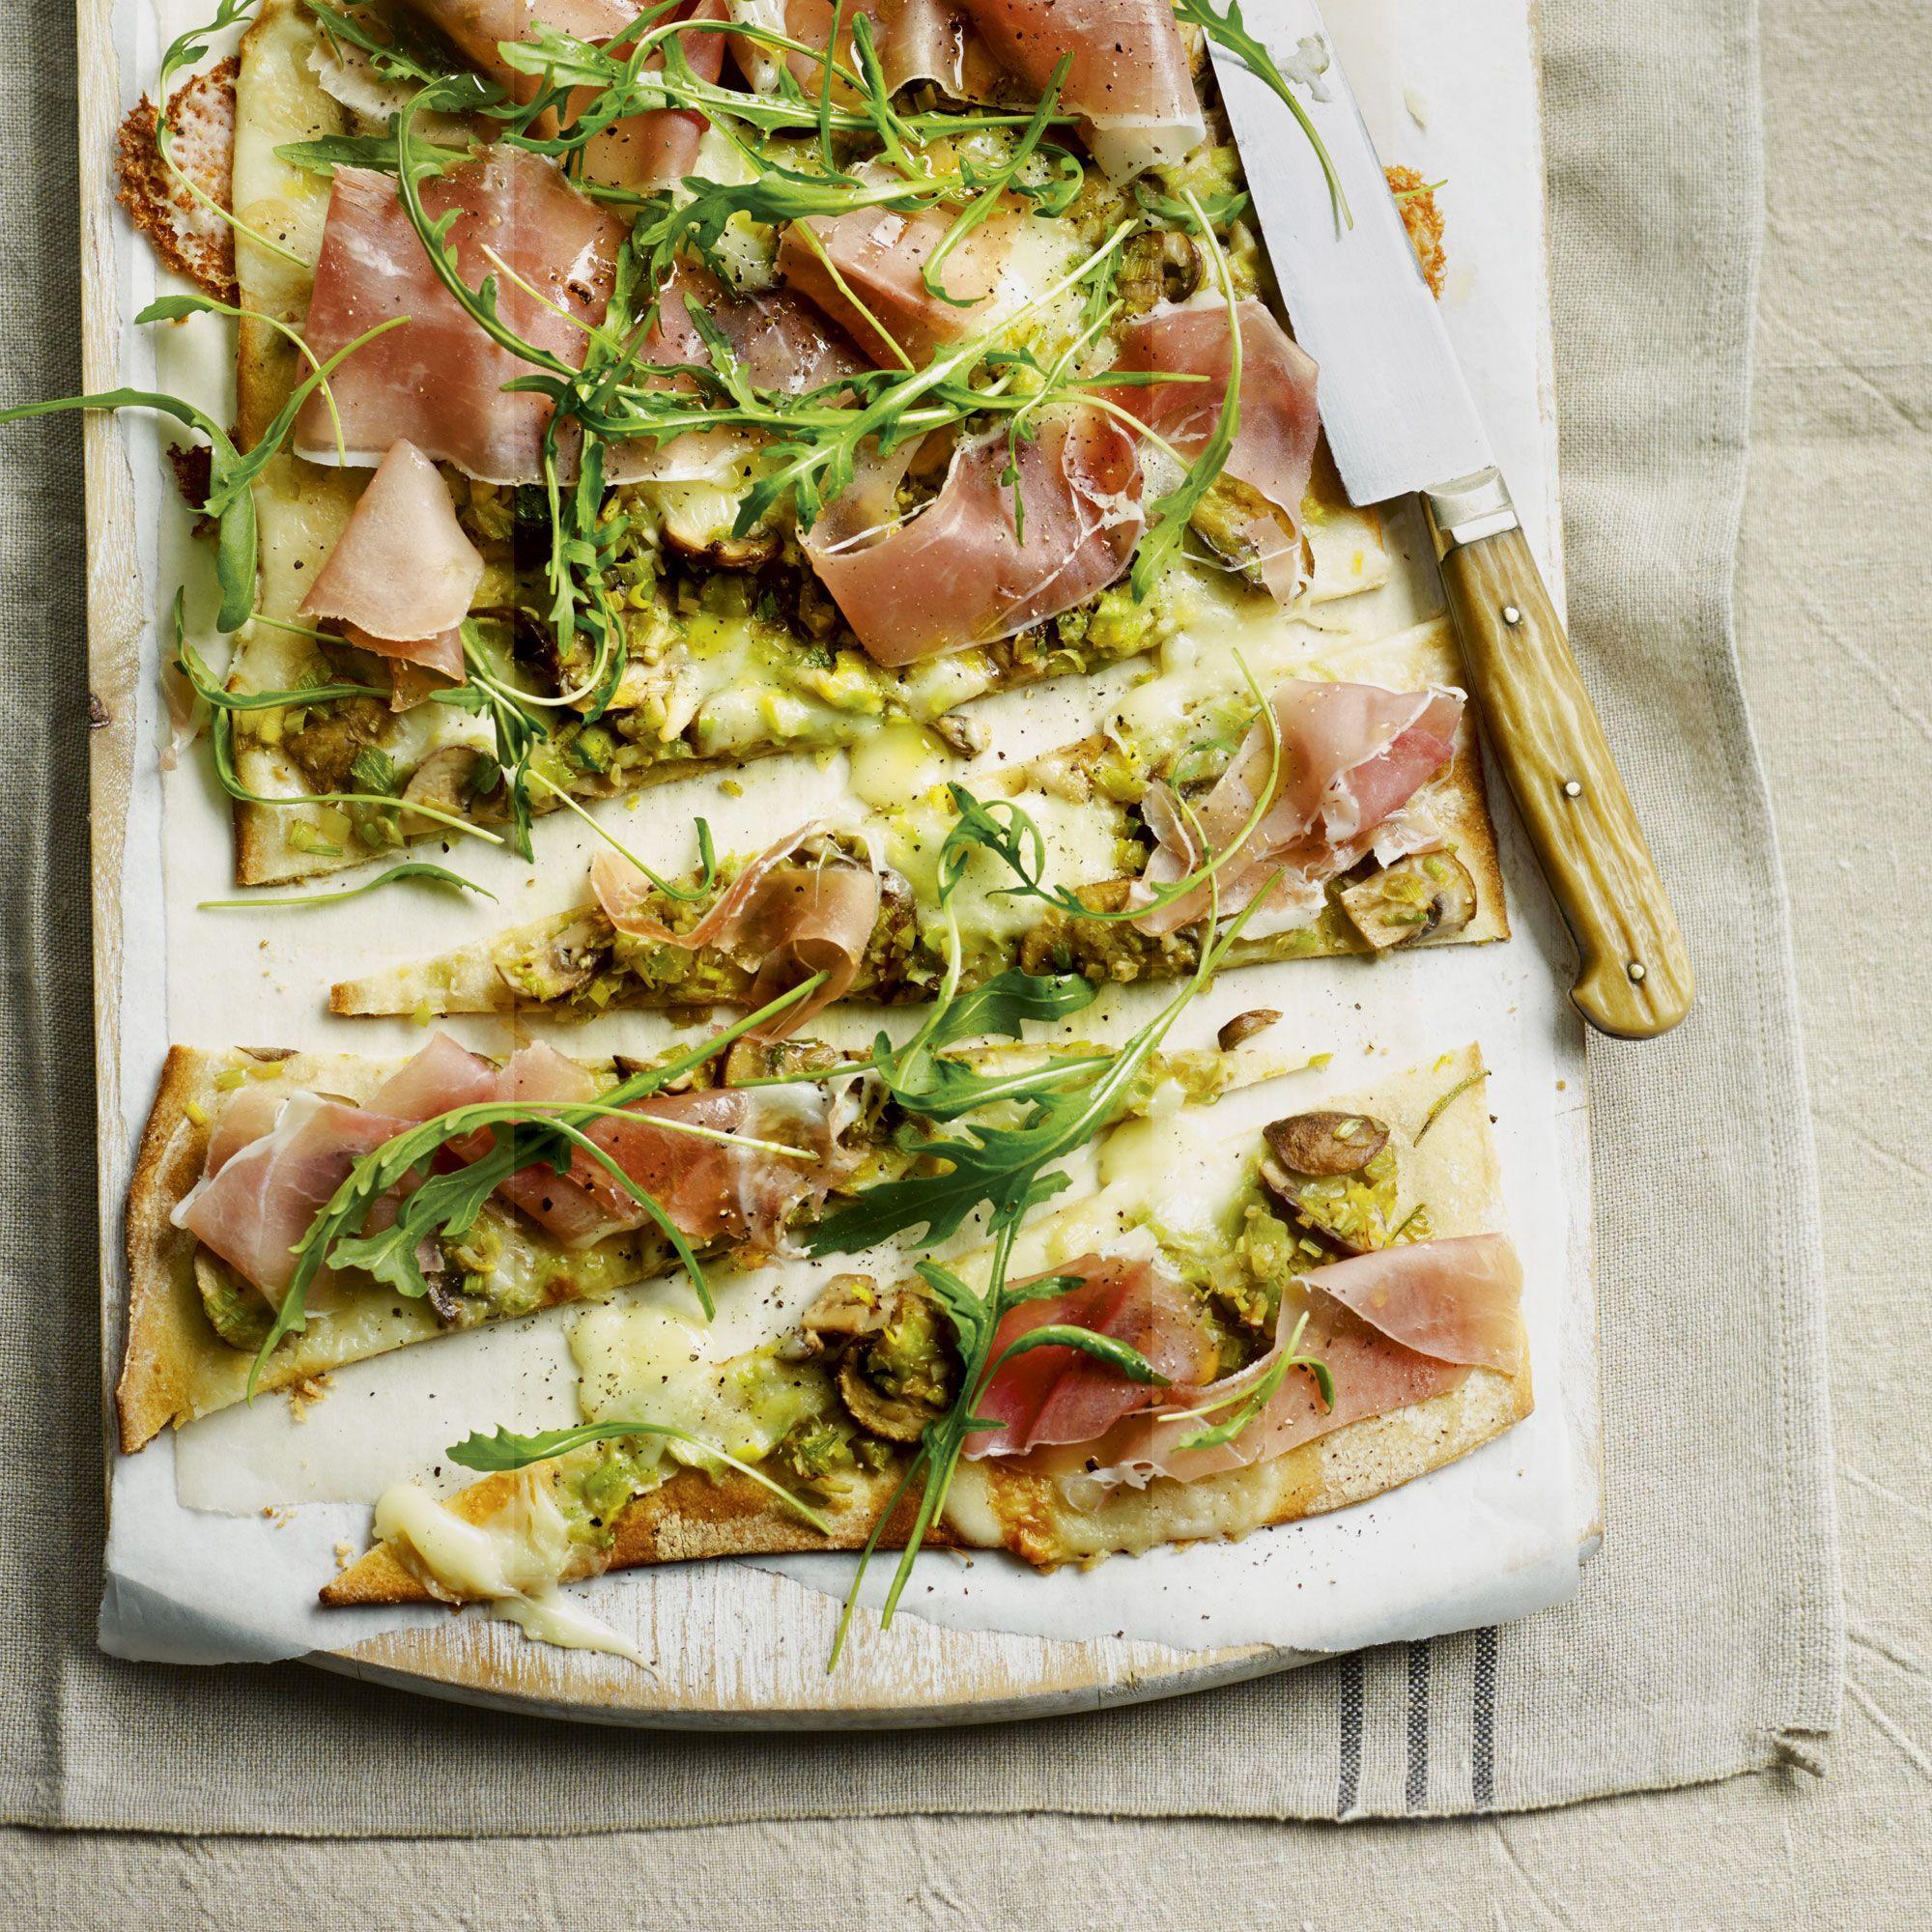 Cheats Leek Mushroom And Taleggio Pizza With Sliced Prosciutto